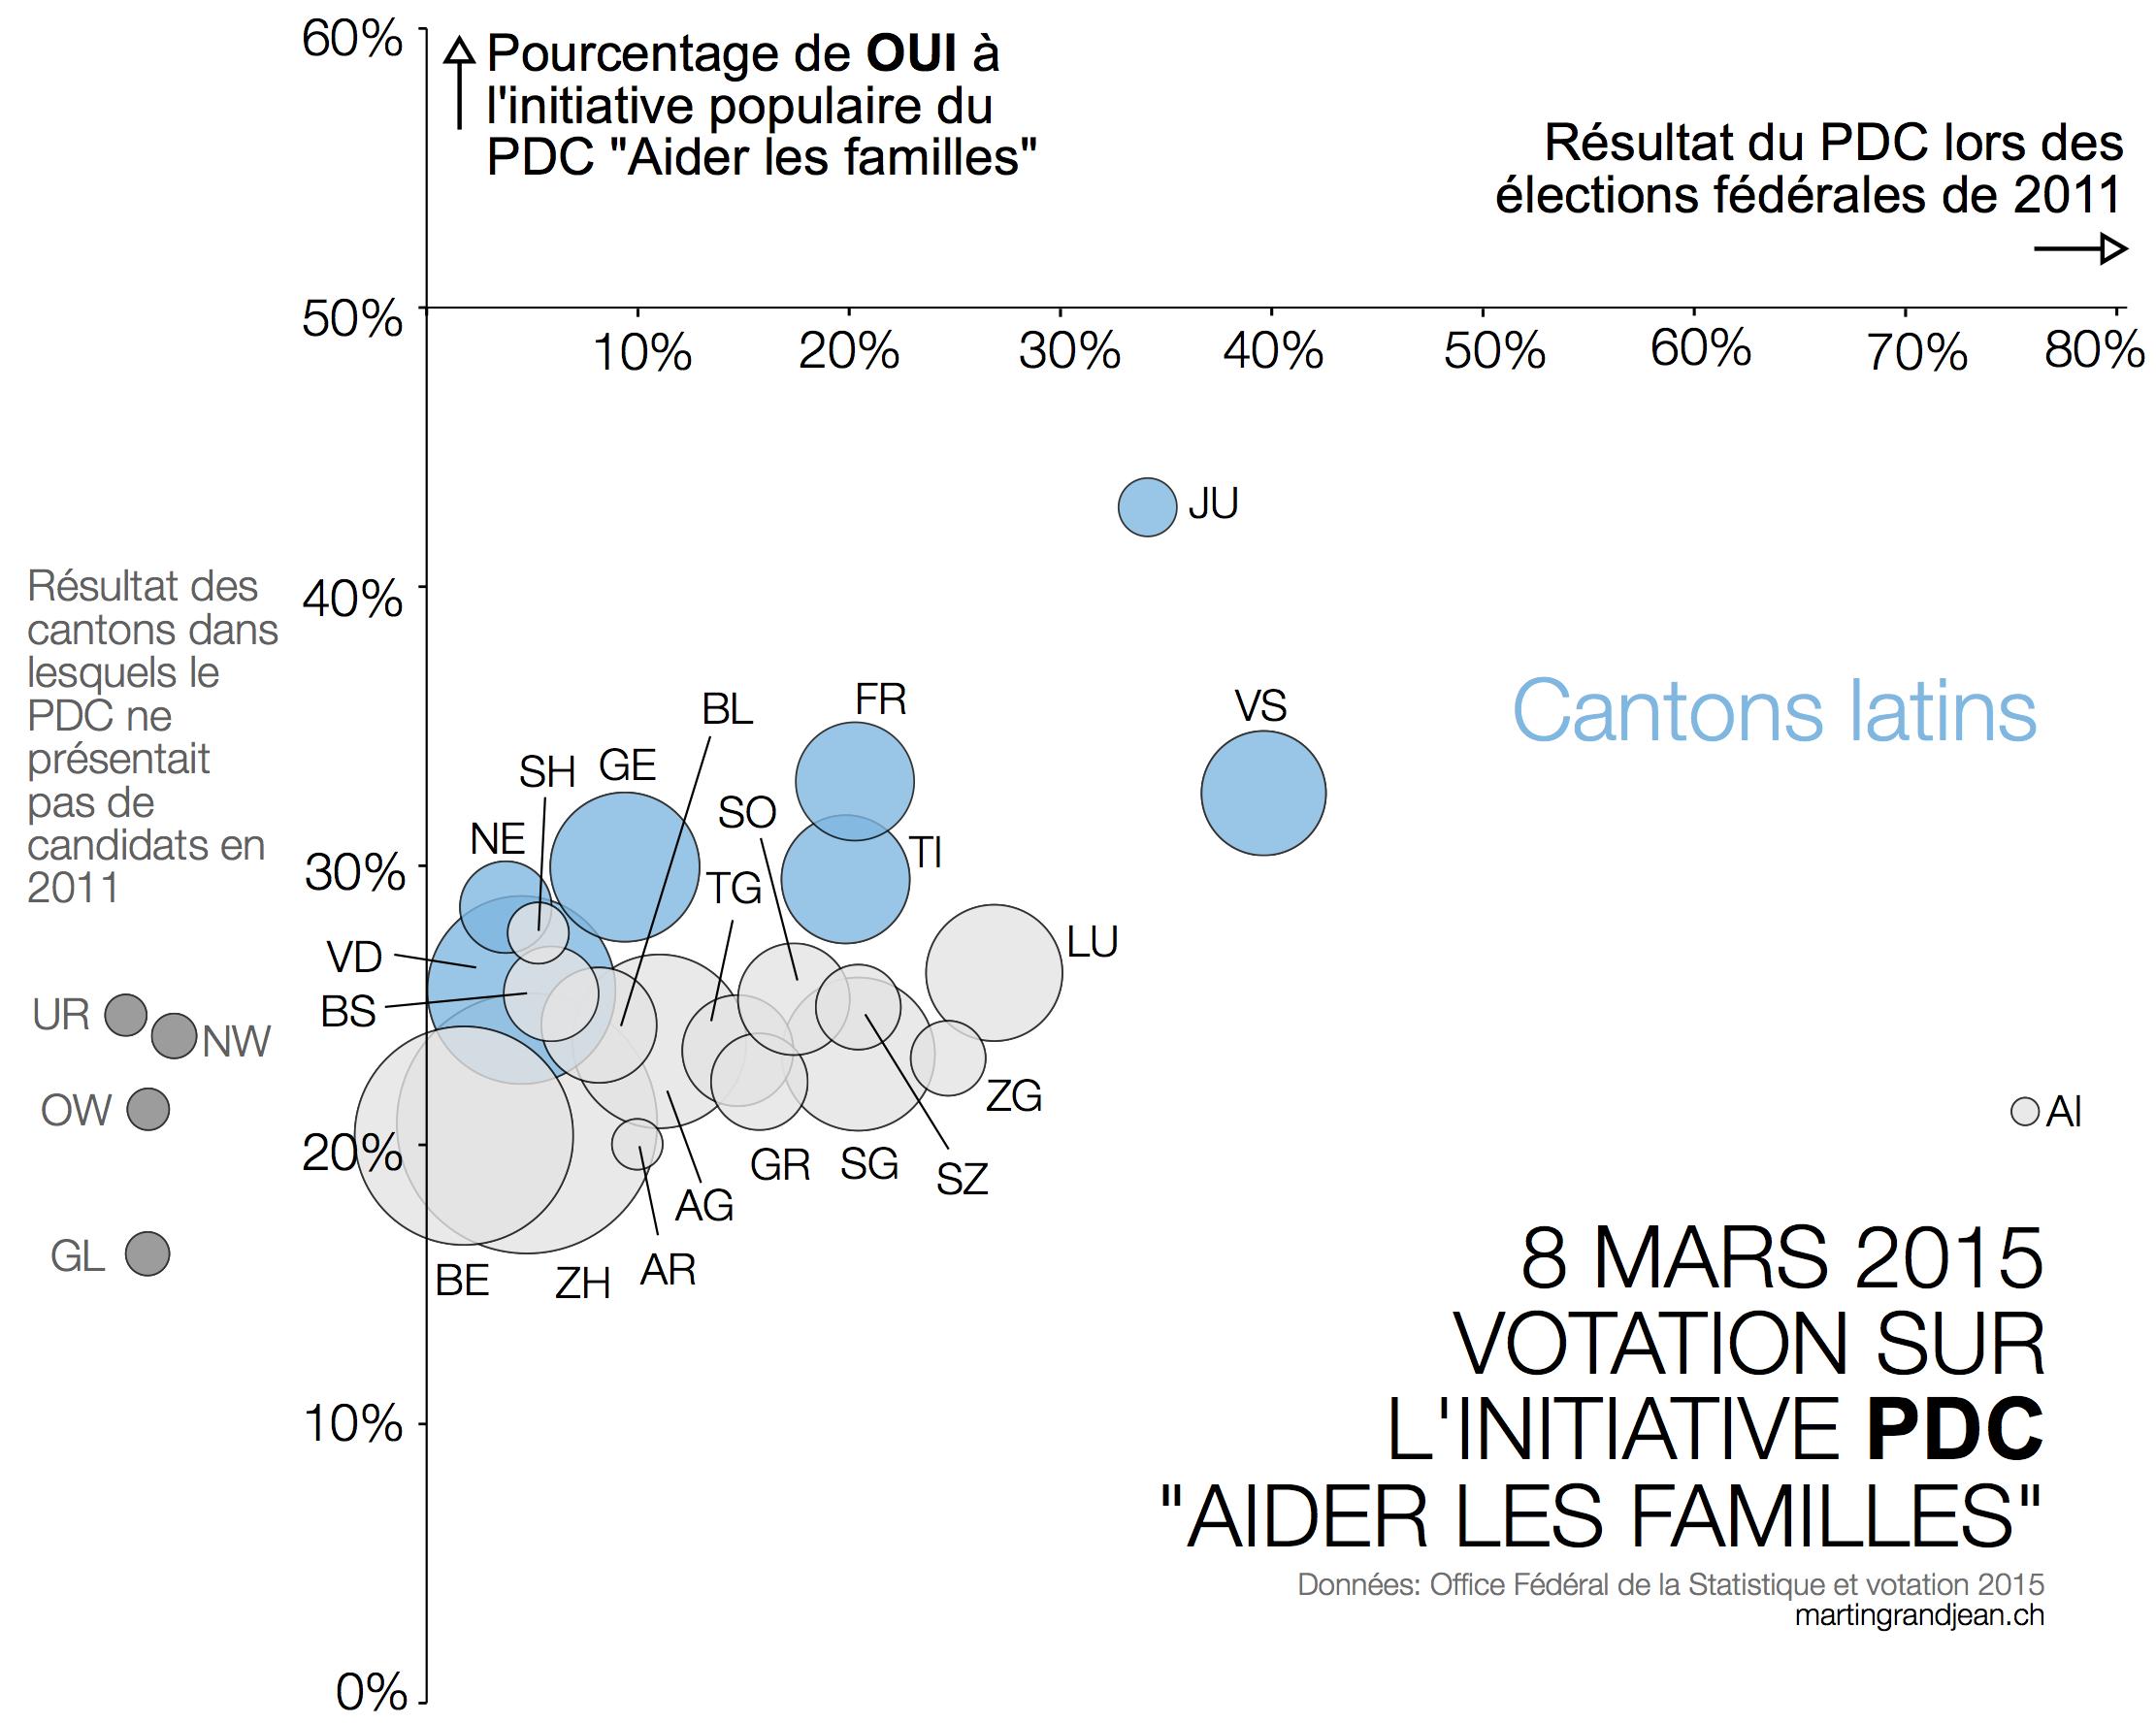 Familles latins votation 8 mars 2015